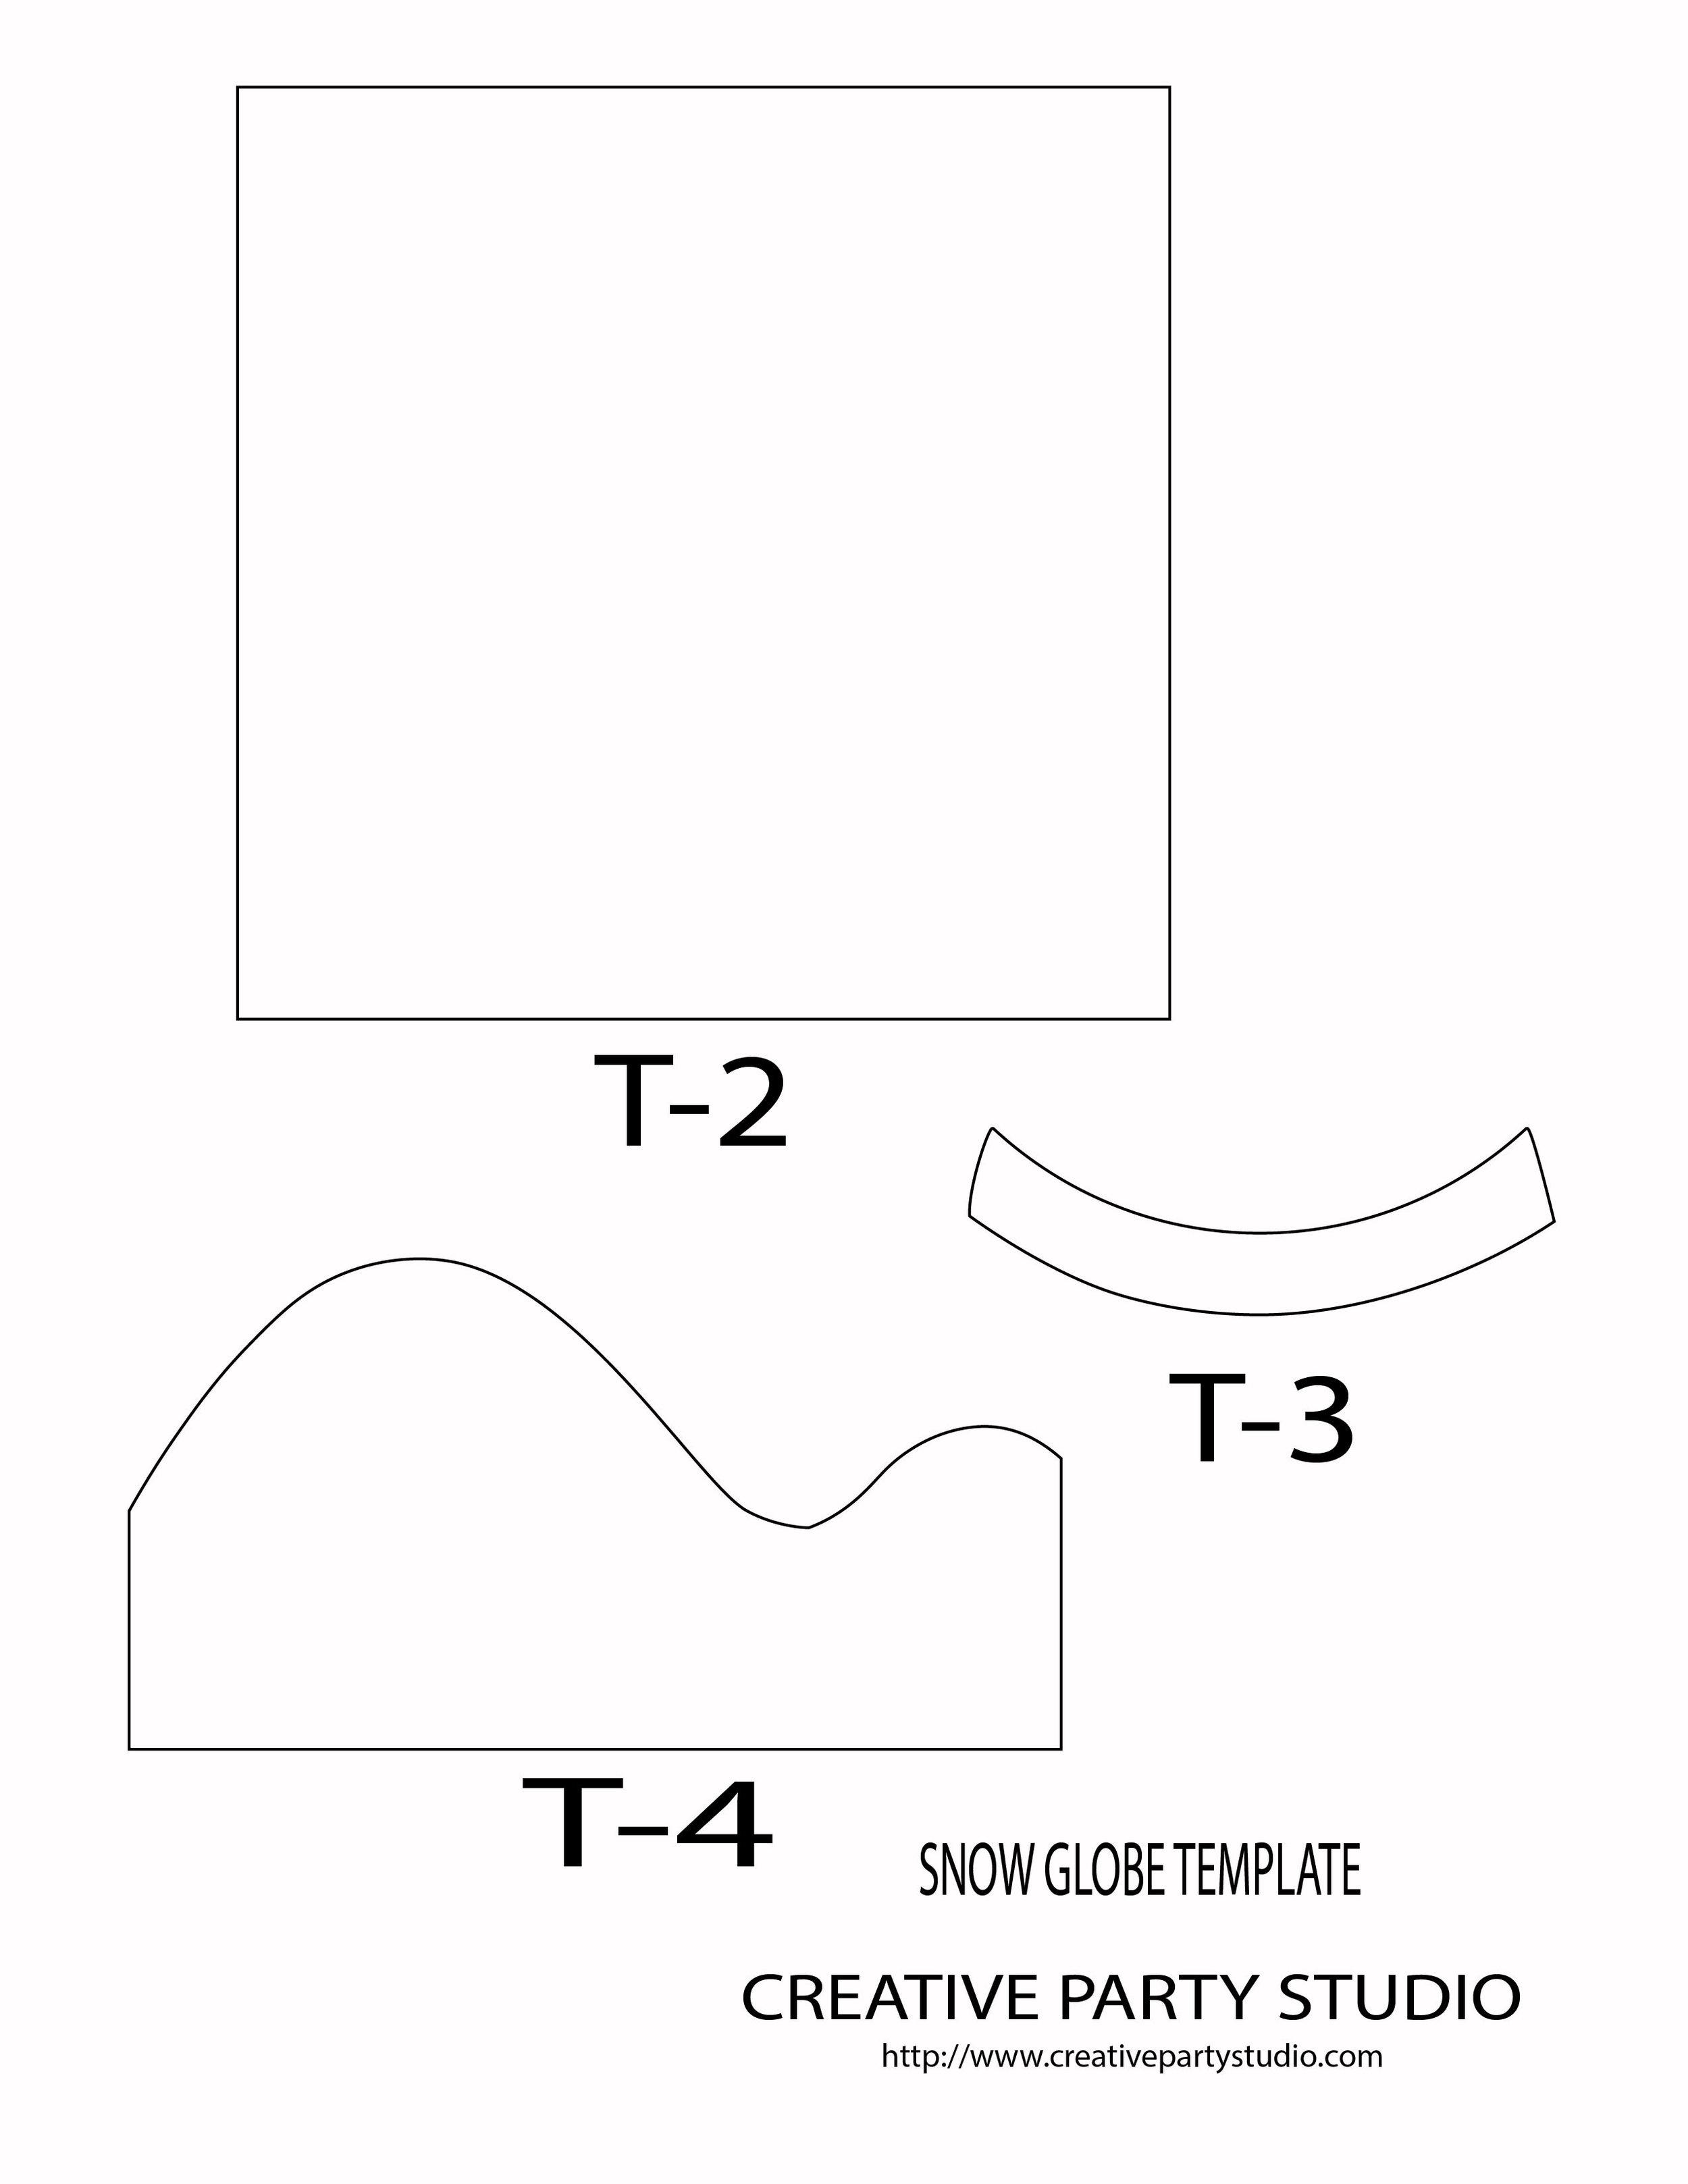 snow globe template (1)-01.jpg